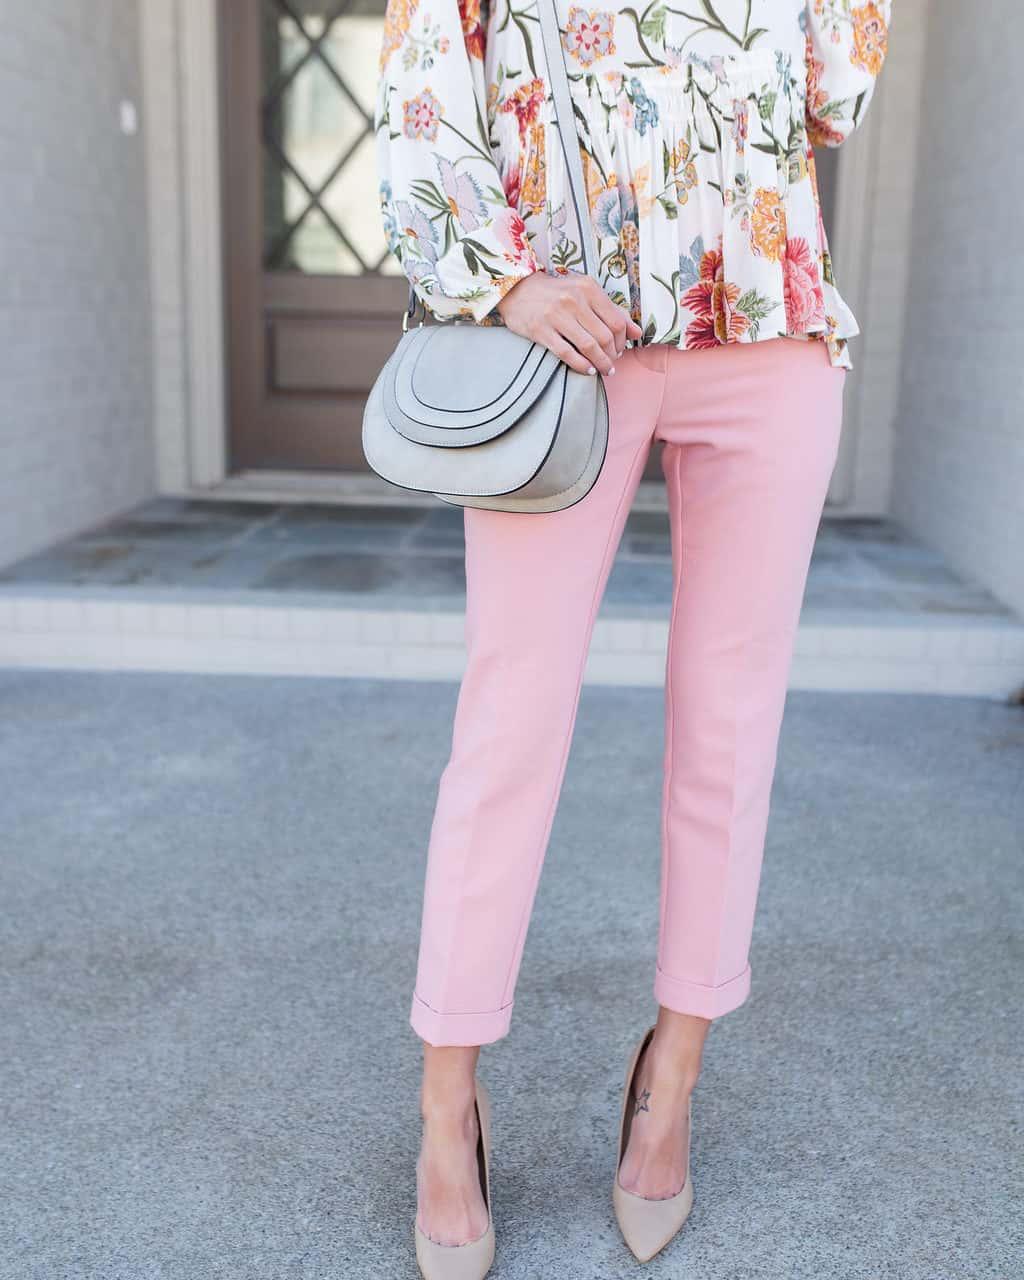 Work Wear Wednesday – Pink Pants